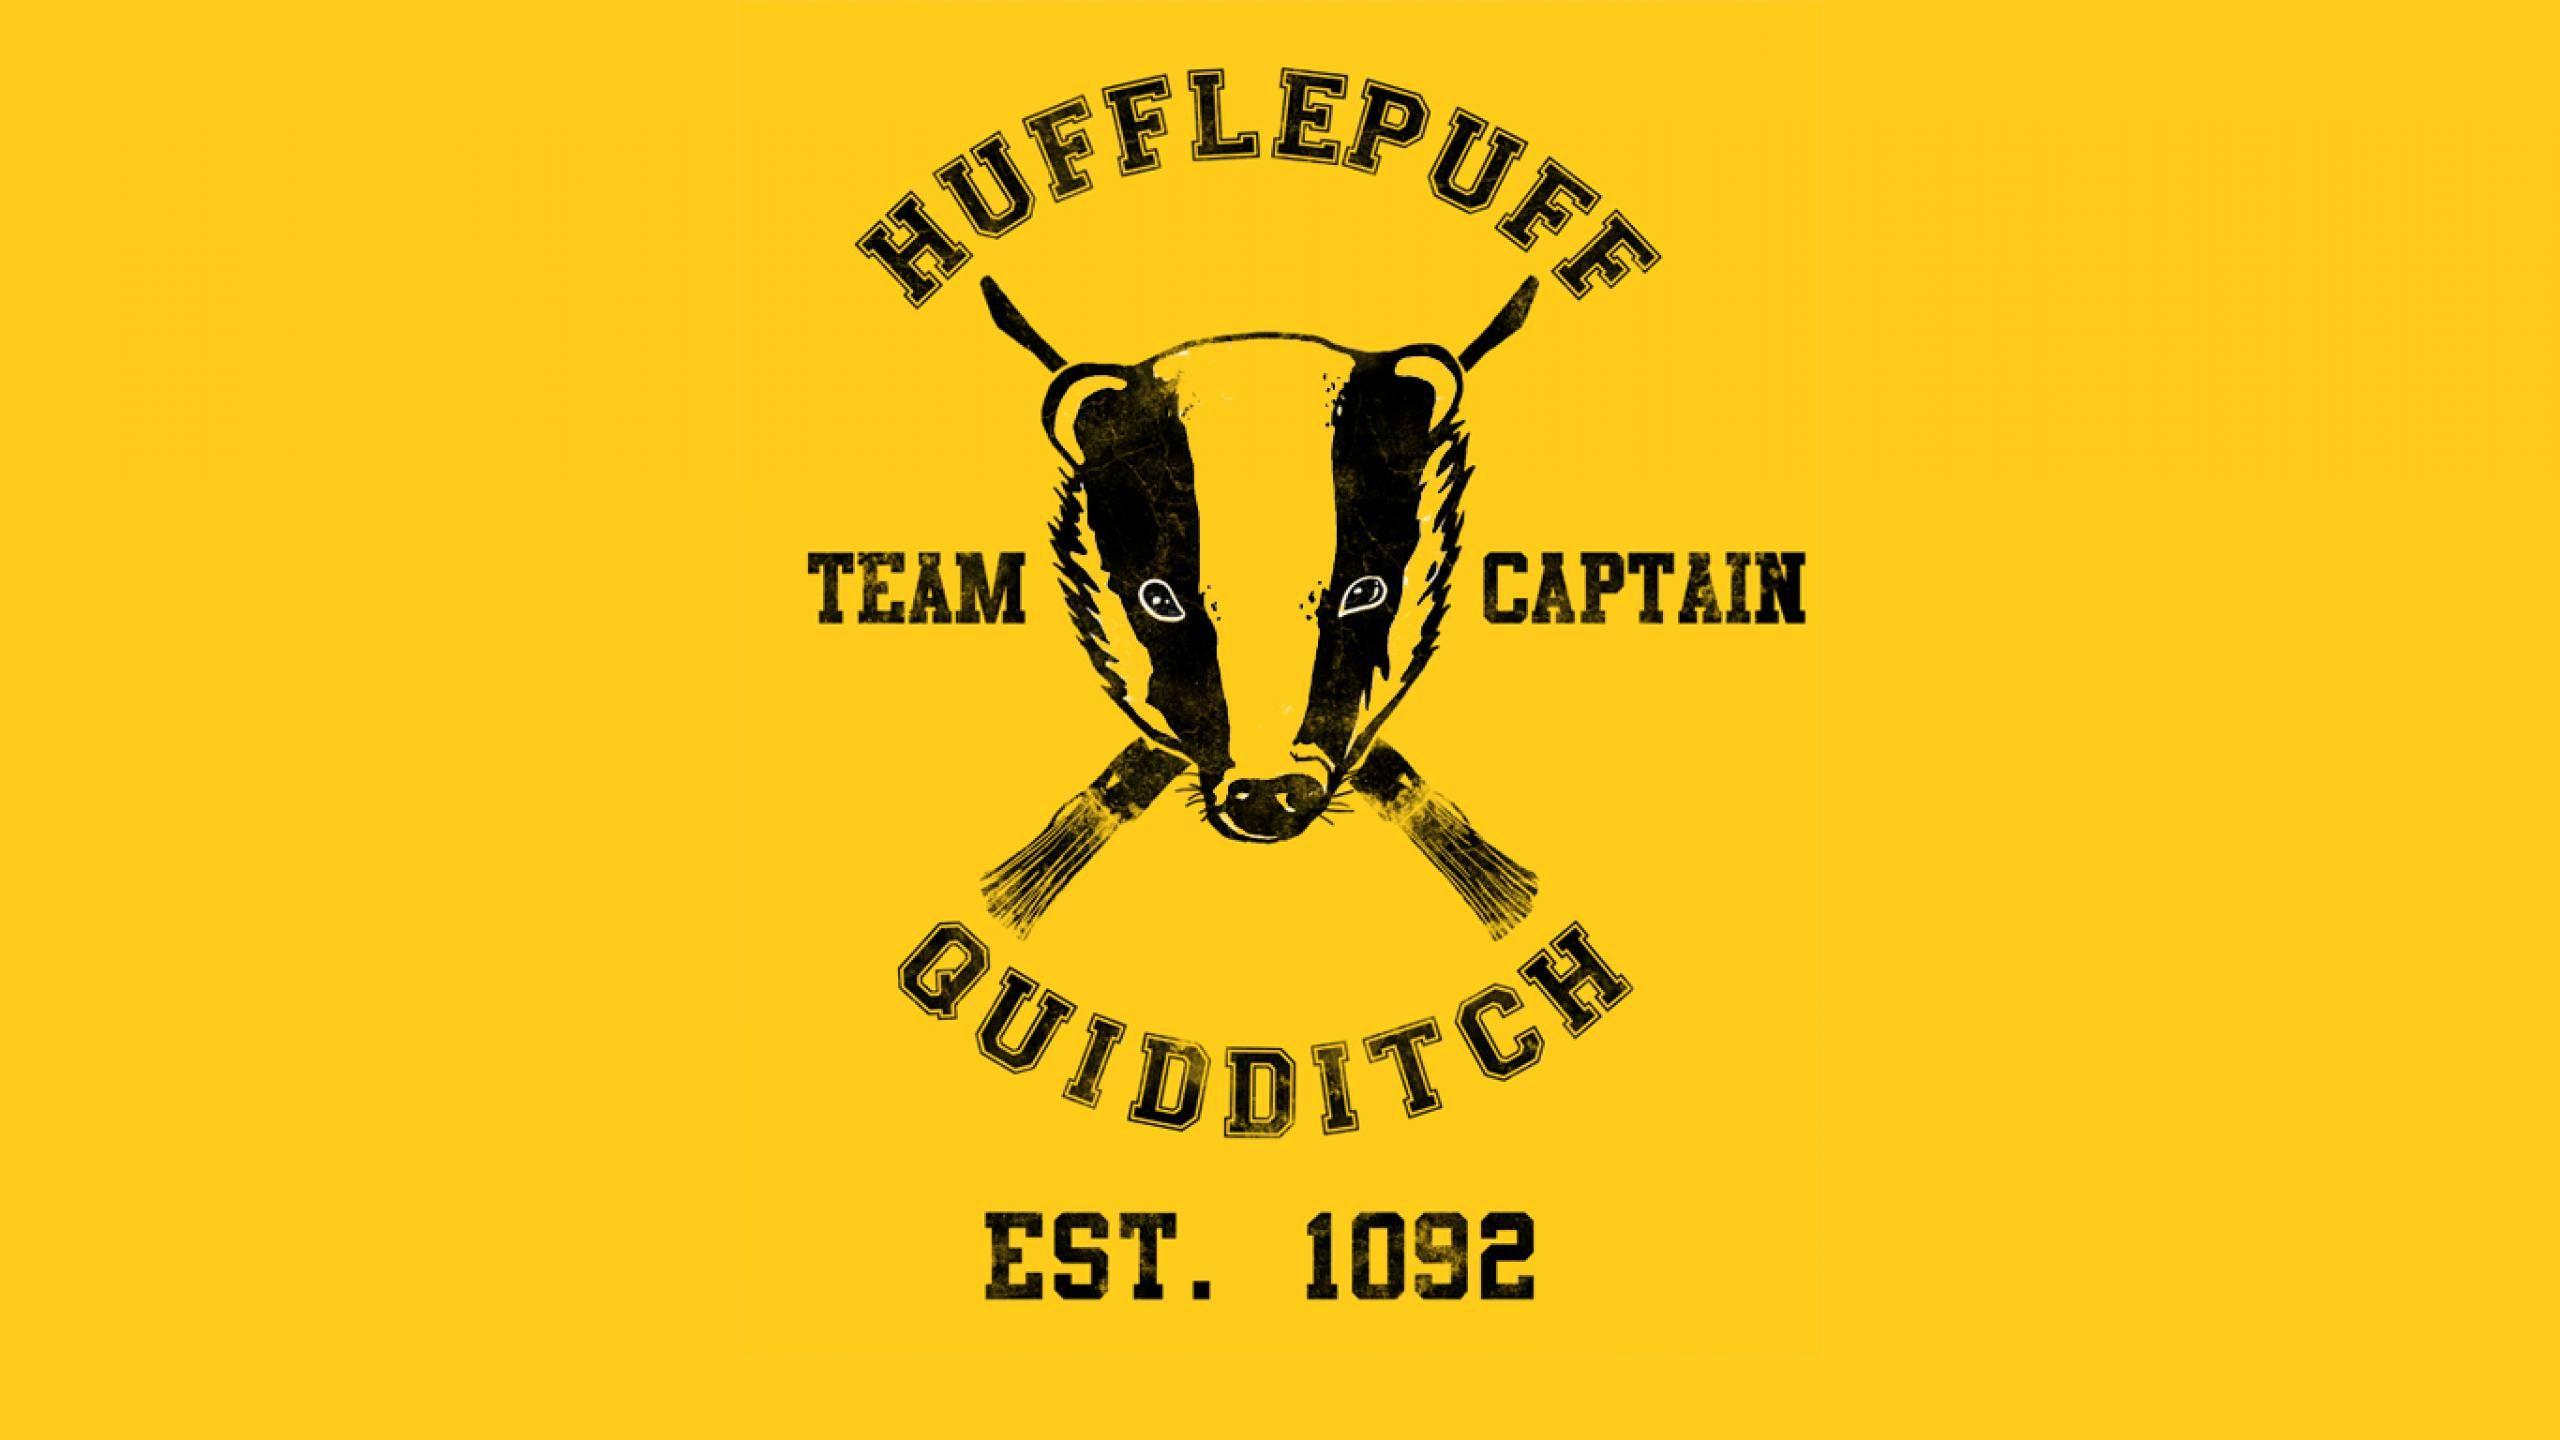 High Definition Mobile Phone And Desktop Wallpapers Harry Potter Wallpaper Hufflepuff Wallpaper Hufflepuff